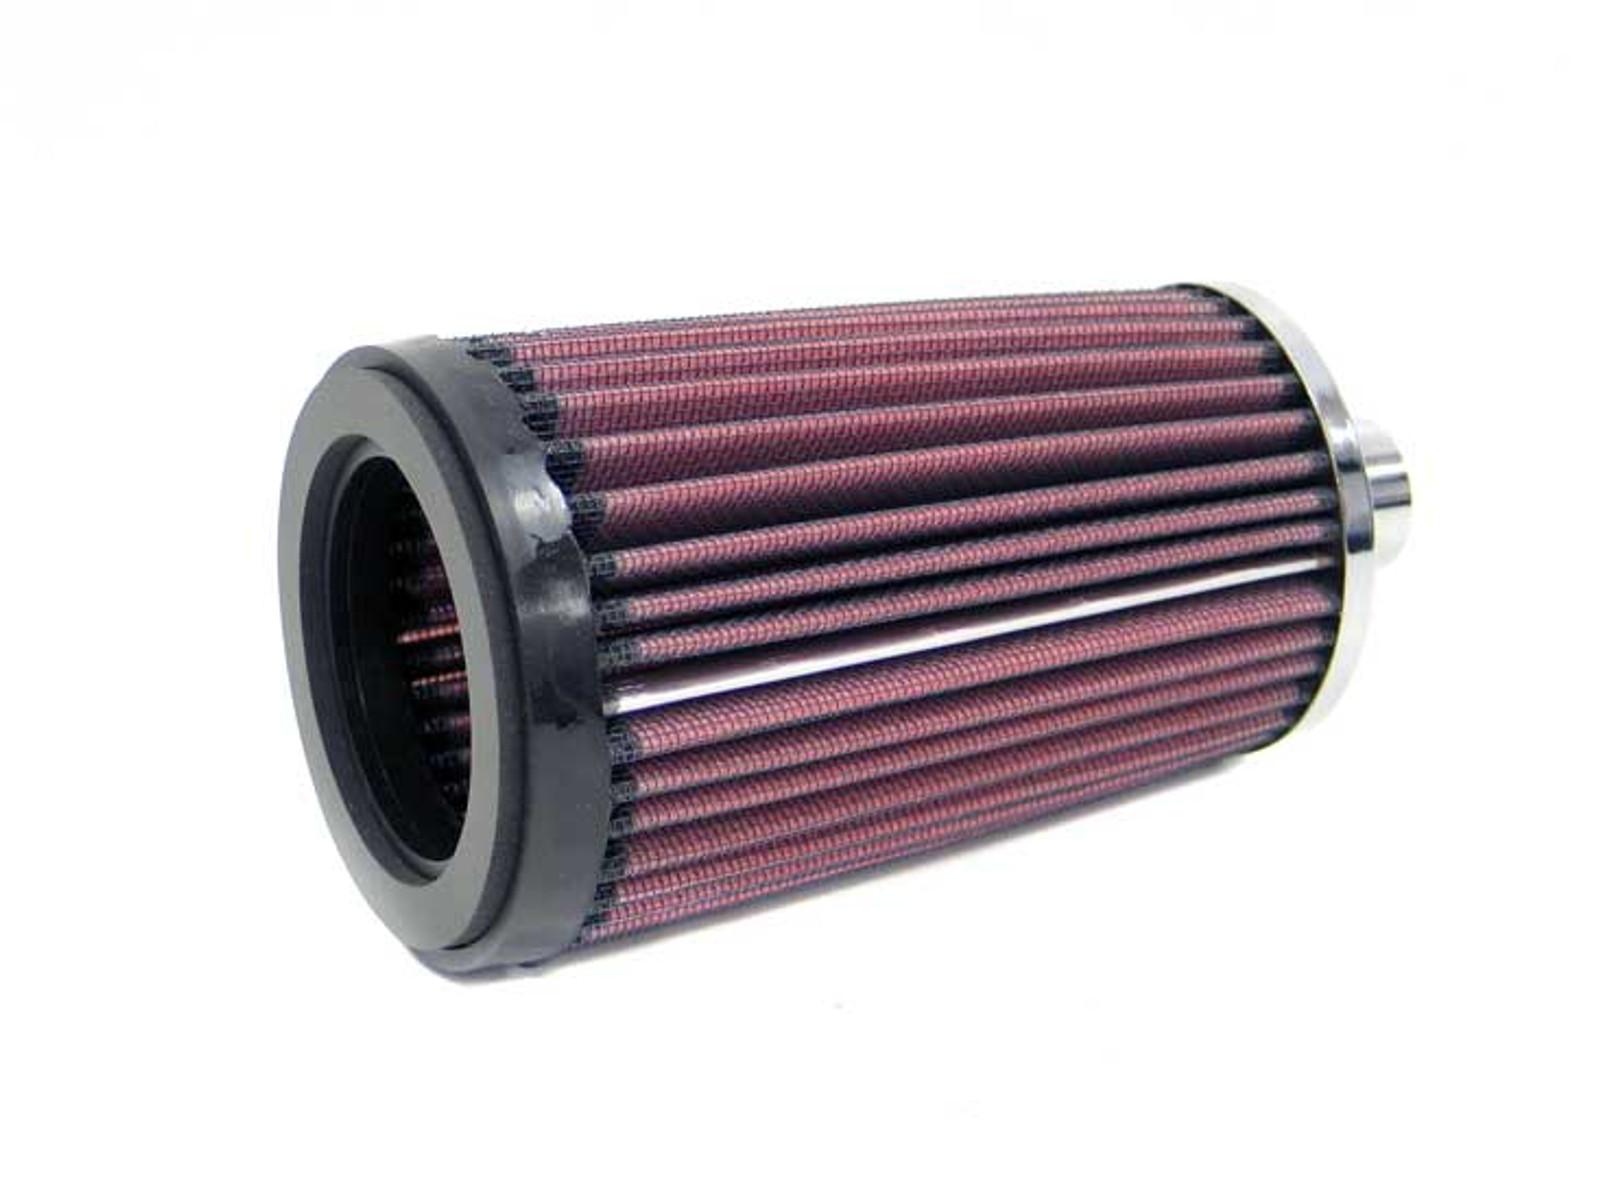 K&N Air Filter SU-1250 for Suzuki GS1000 1100 E L S 78-83/GS750 GSX1100E  GSX750